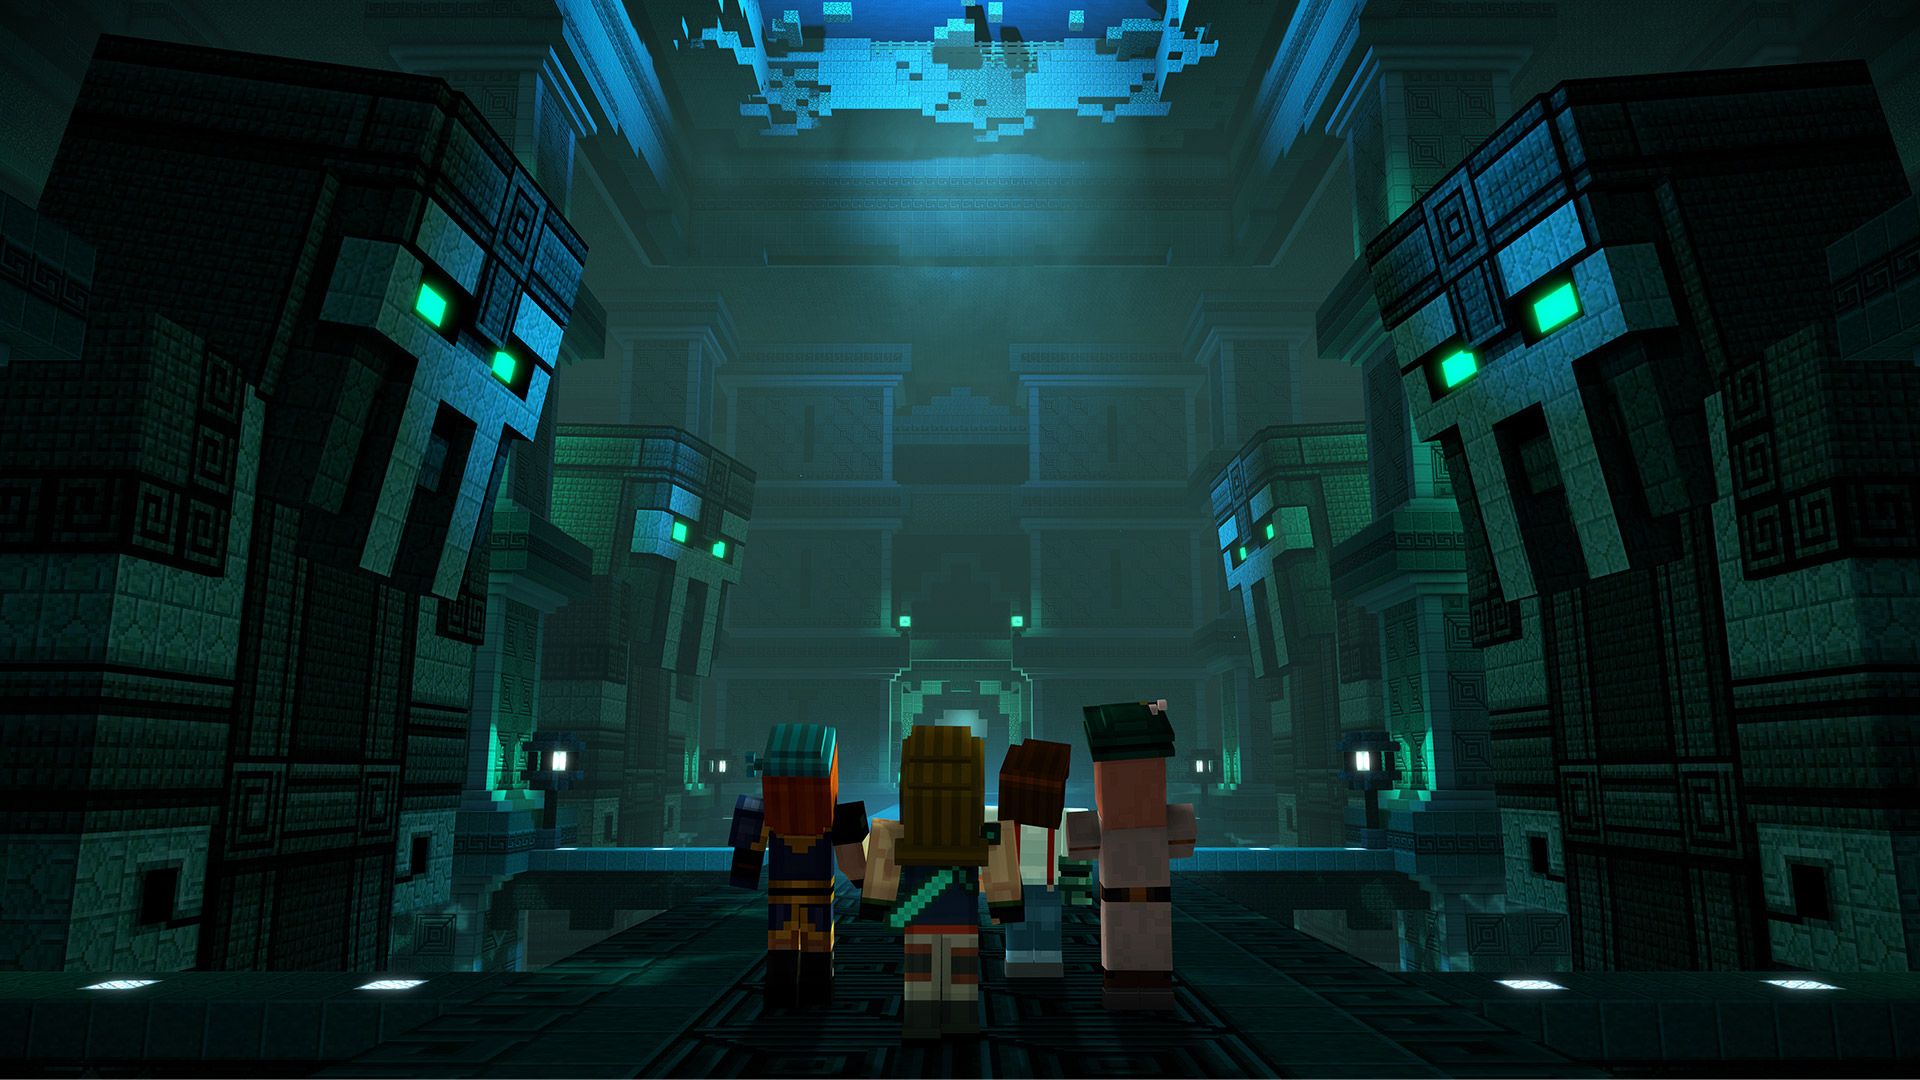 Free Minecraft: Story Mode Season 2 Wallpaper in 1920x1080